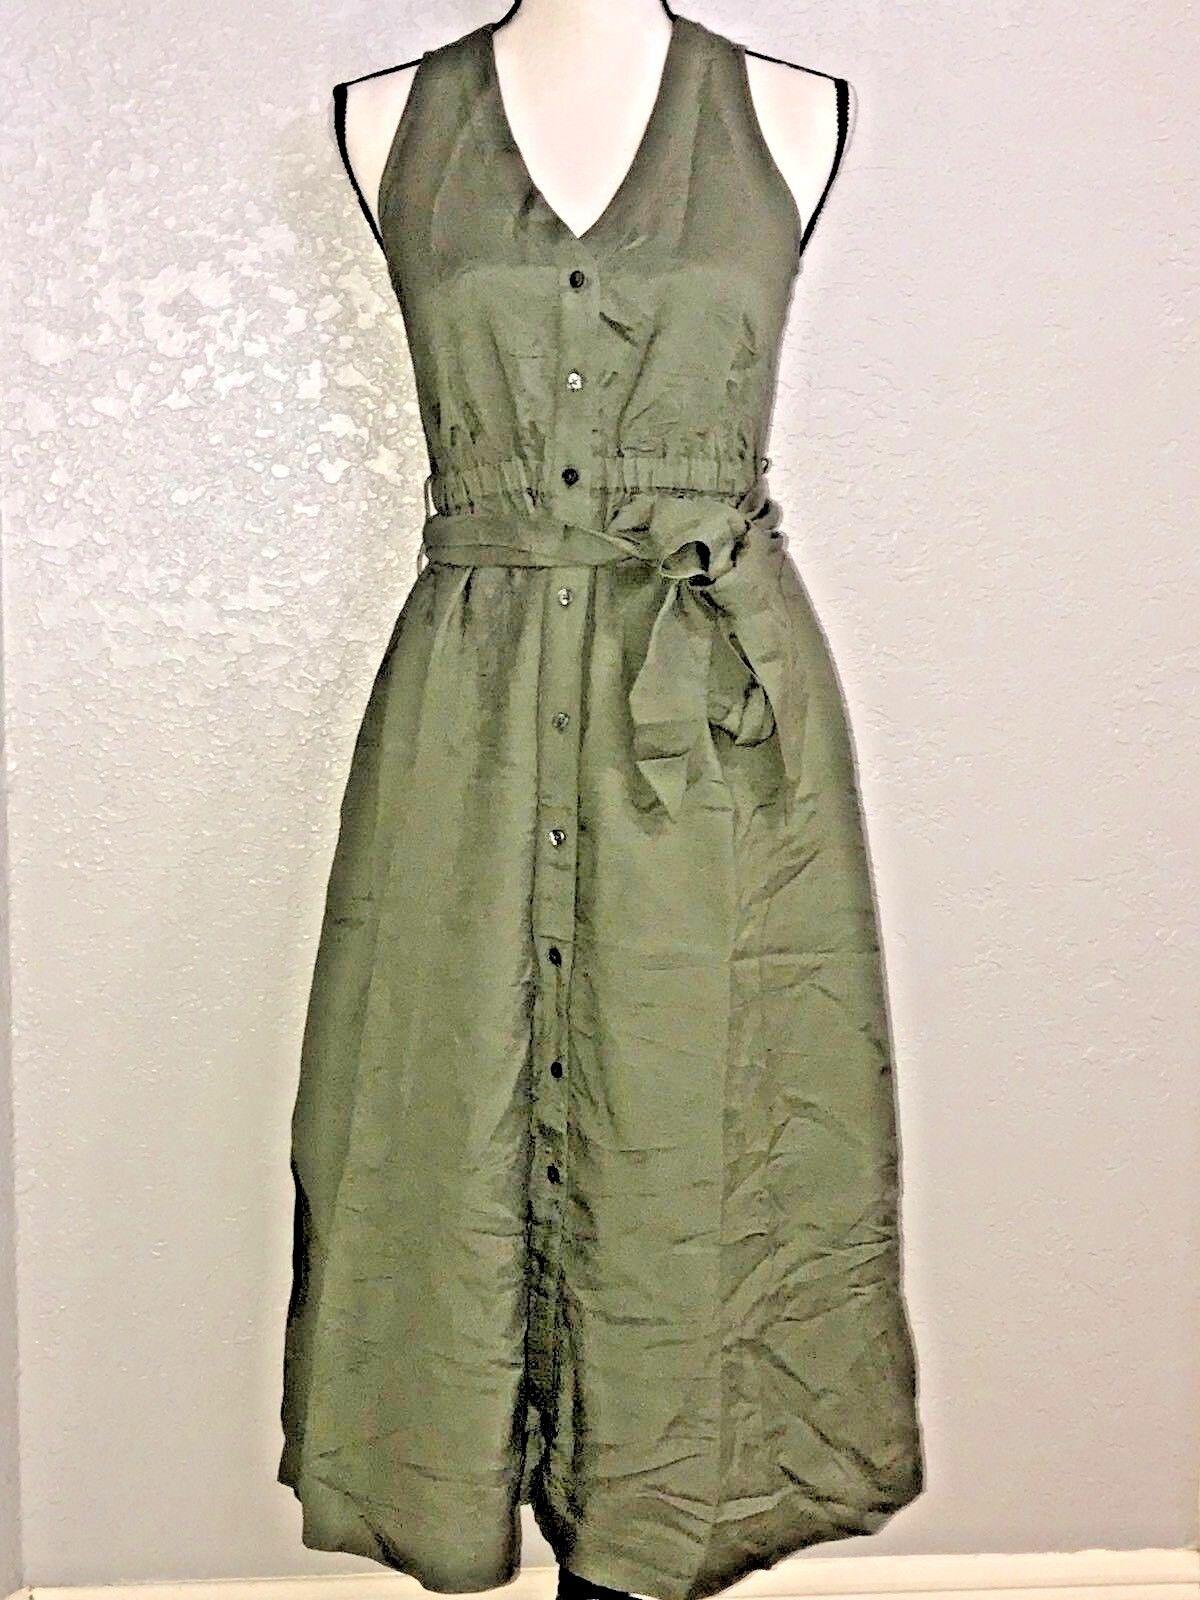 NEW Ann Taylor Shirt Dress Size 4 Olive Green Sleeveless Button Front